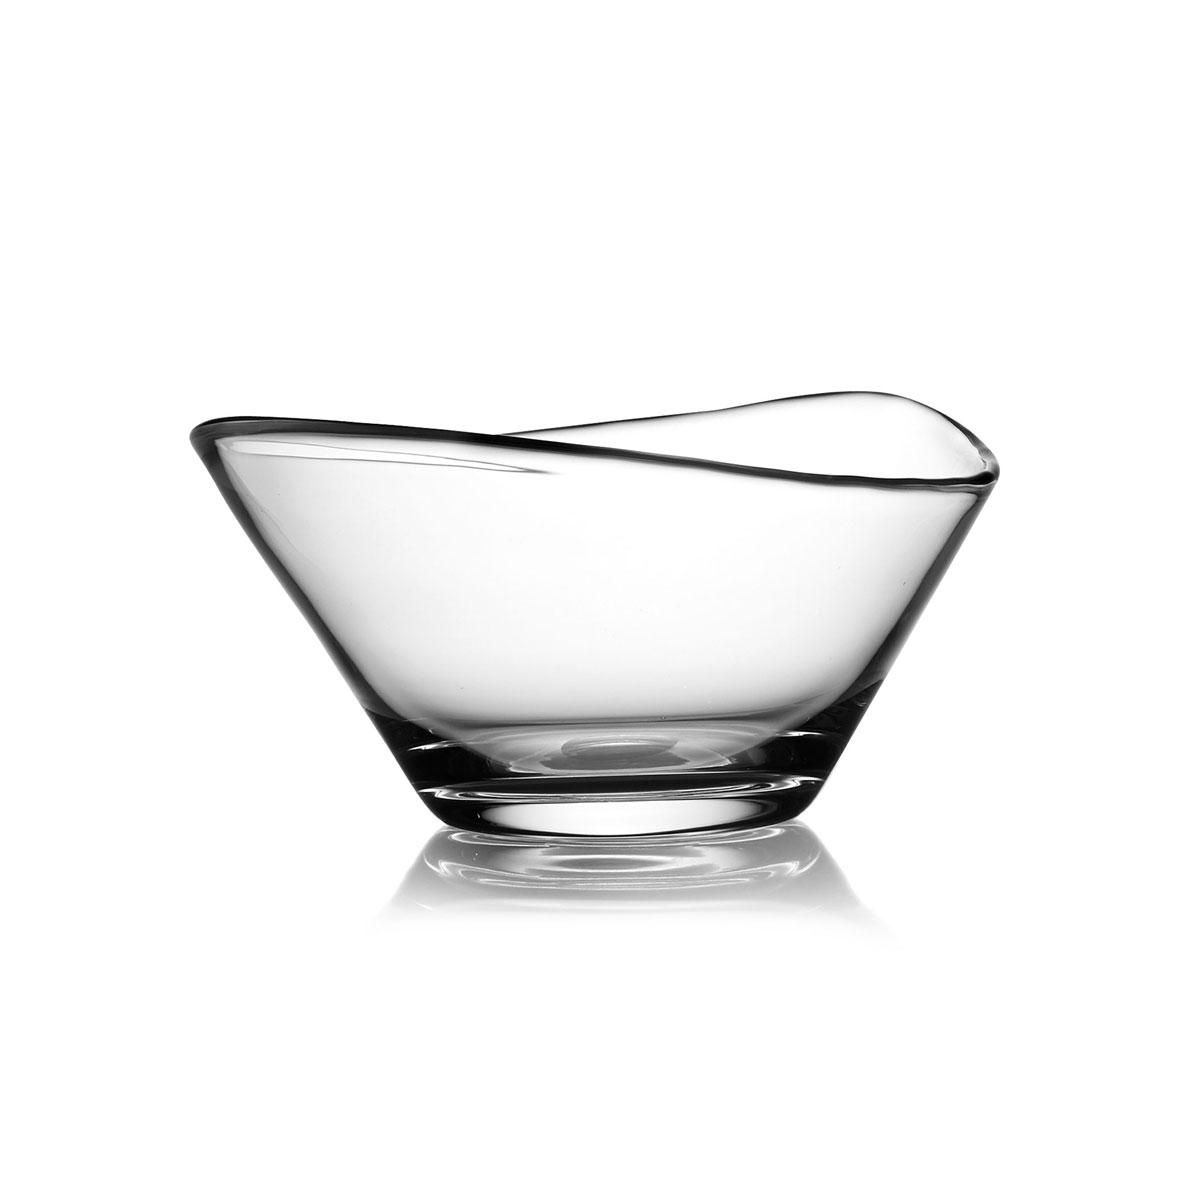 "Nambe Moderne 9"" Bowl"